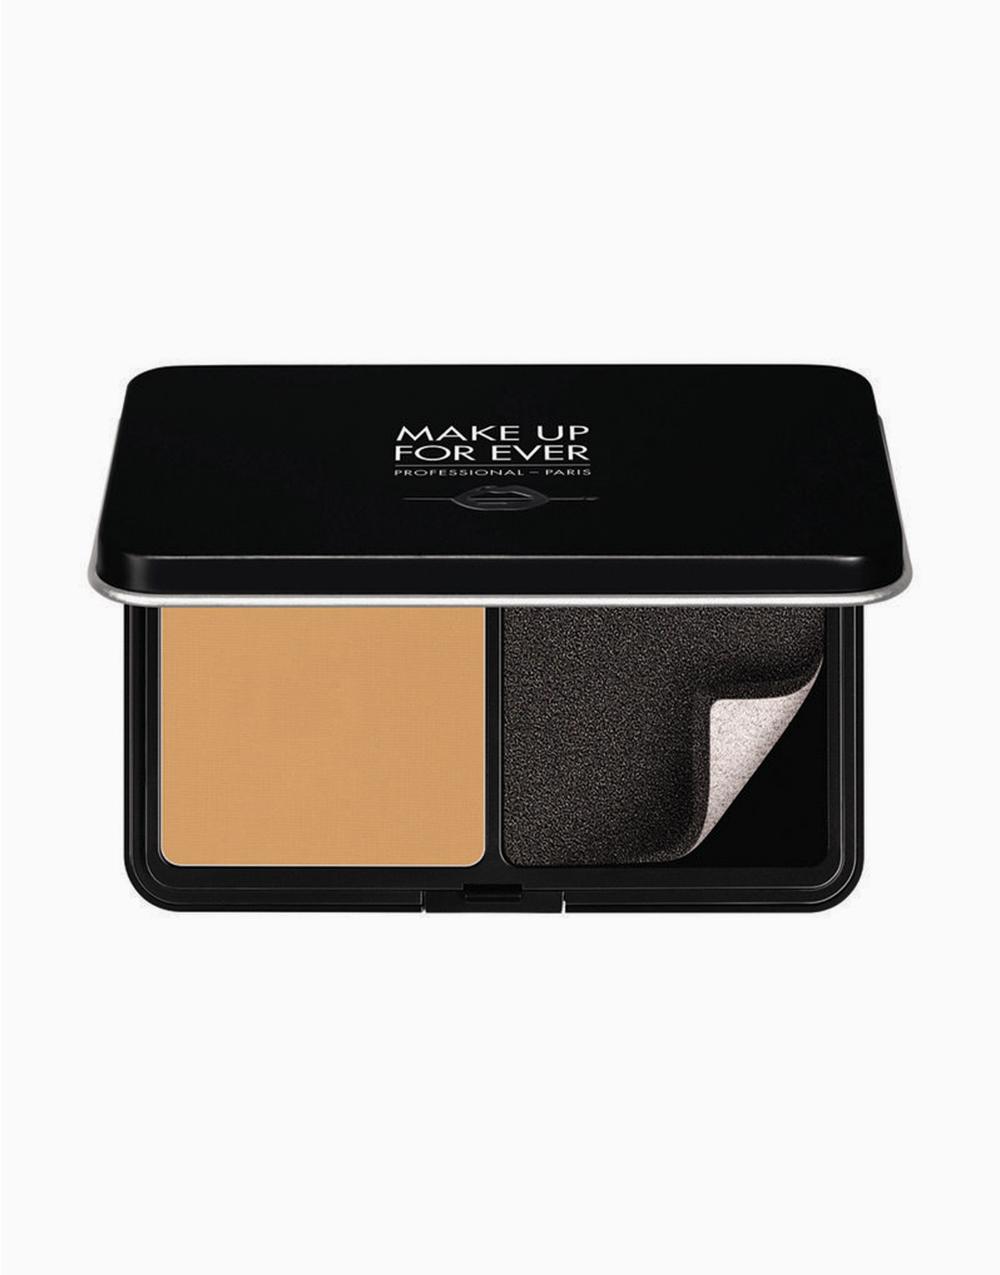 Matte Velvet Skin Compact (11g) by Make Up For Ever | Y365